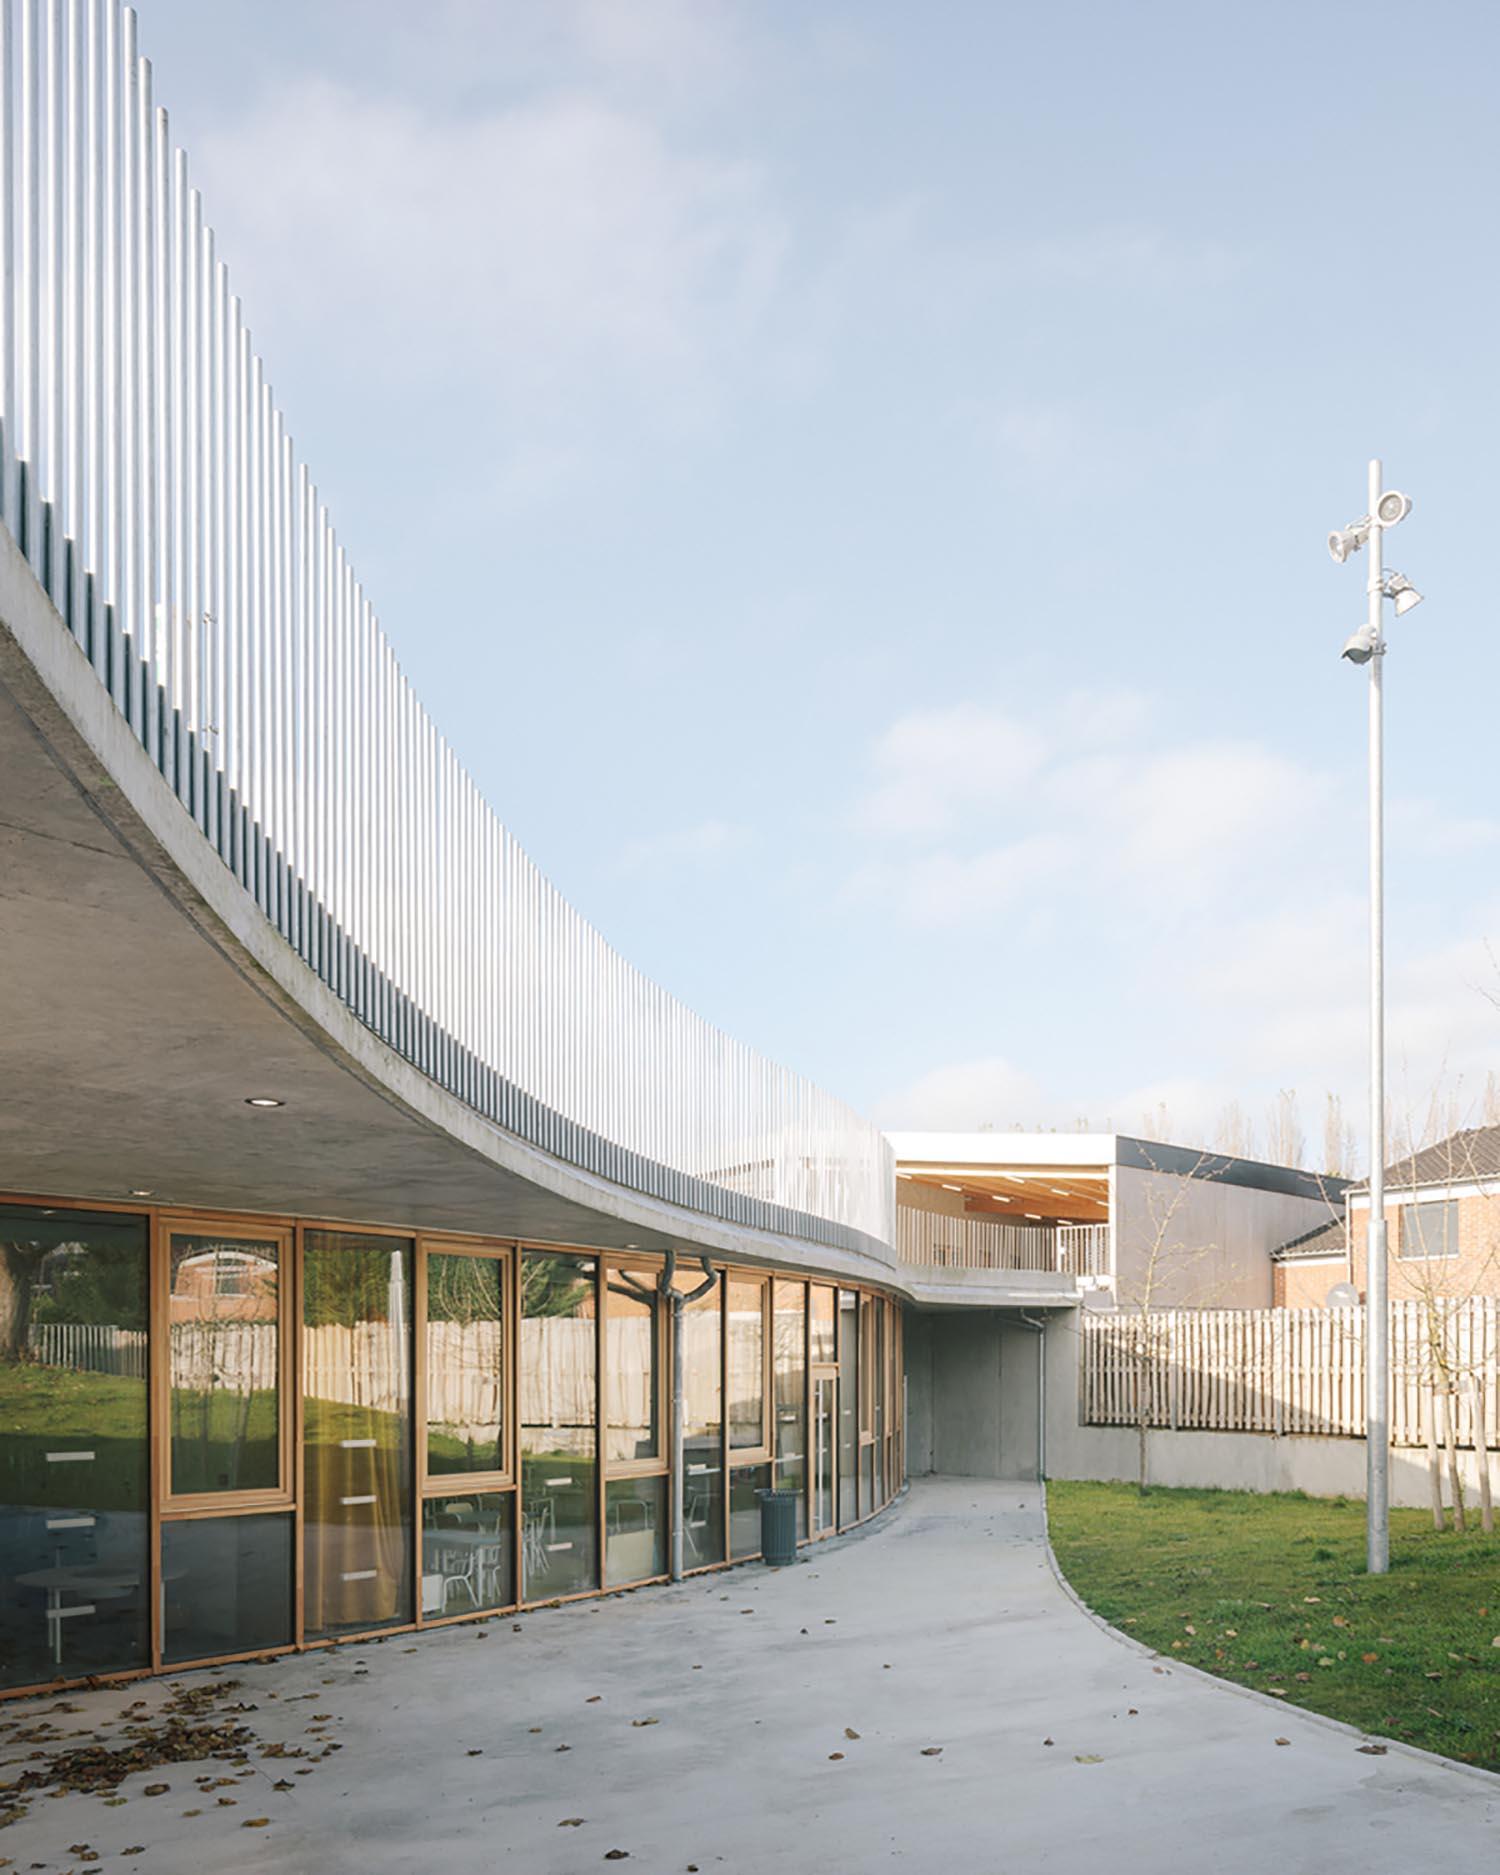 17_-_SAM_Architecture_-_Groupe_Scolaire_Rostand_-_Lille.jpg